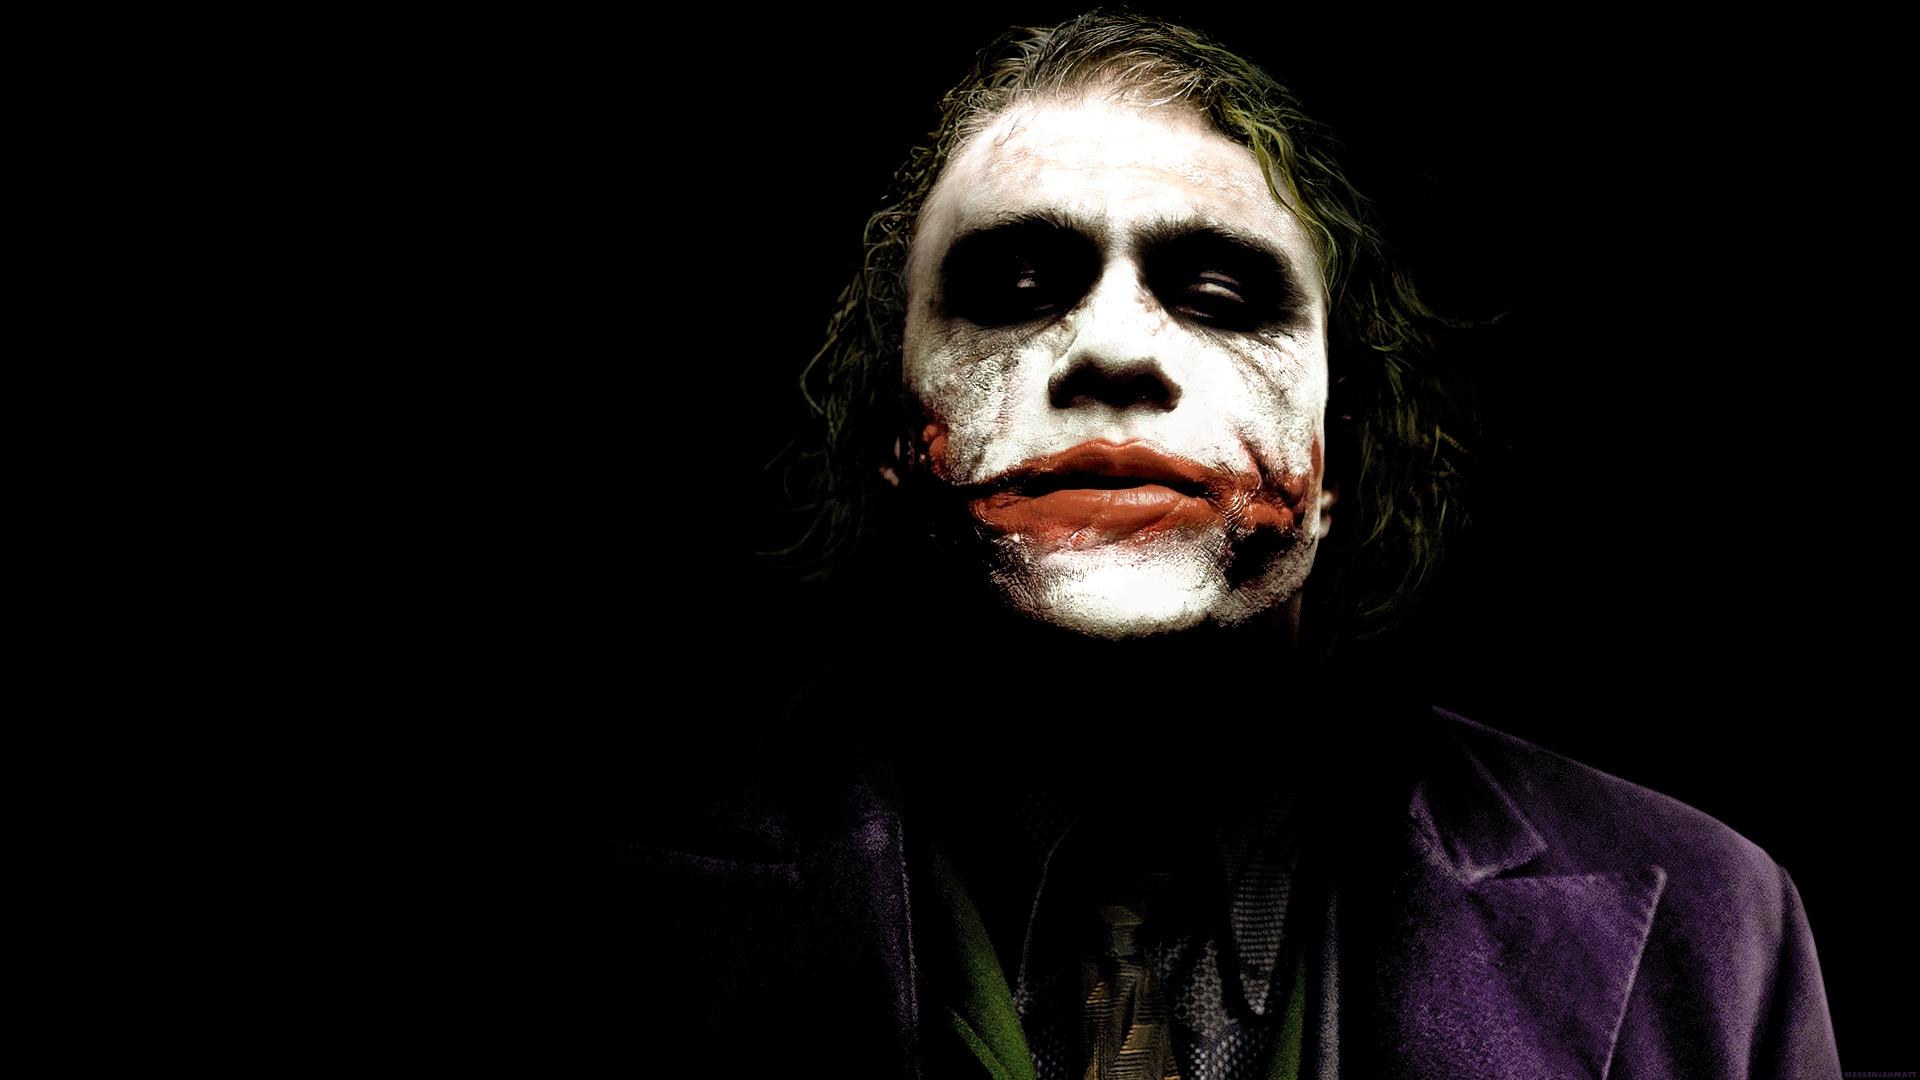 Download The Joker Wallpaper 1920x1080 Wallpoper 298271 1920x1080